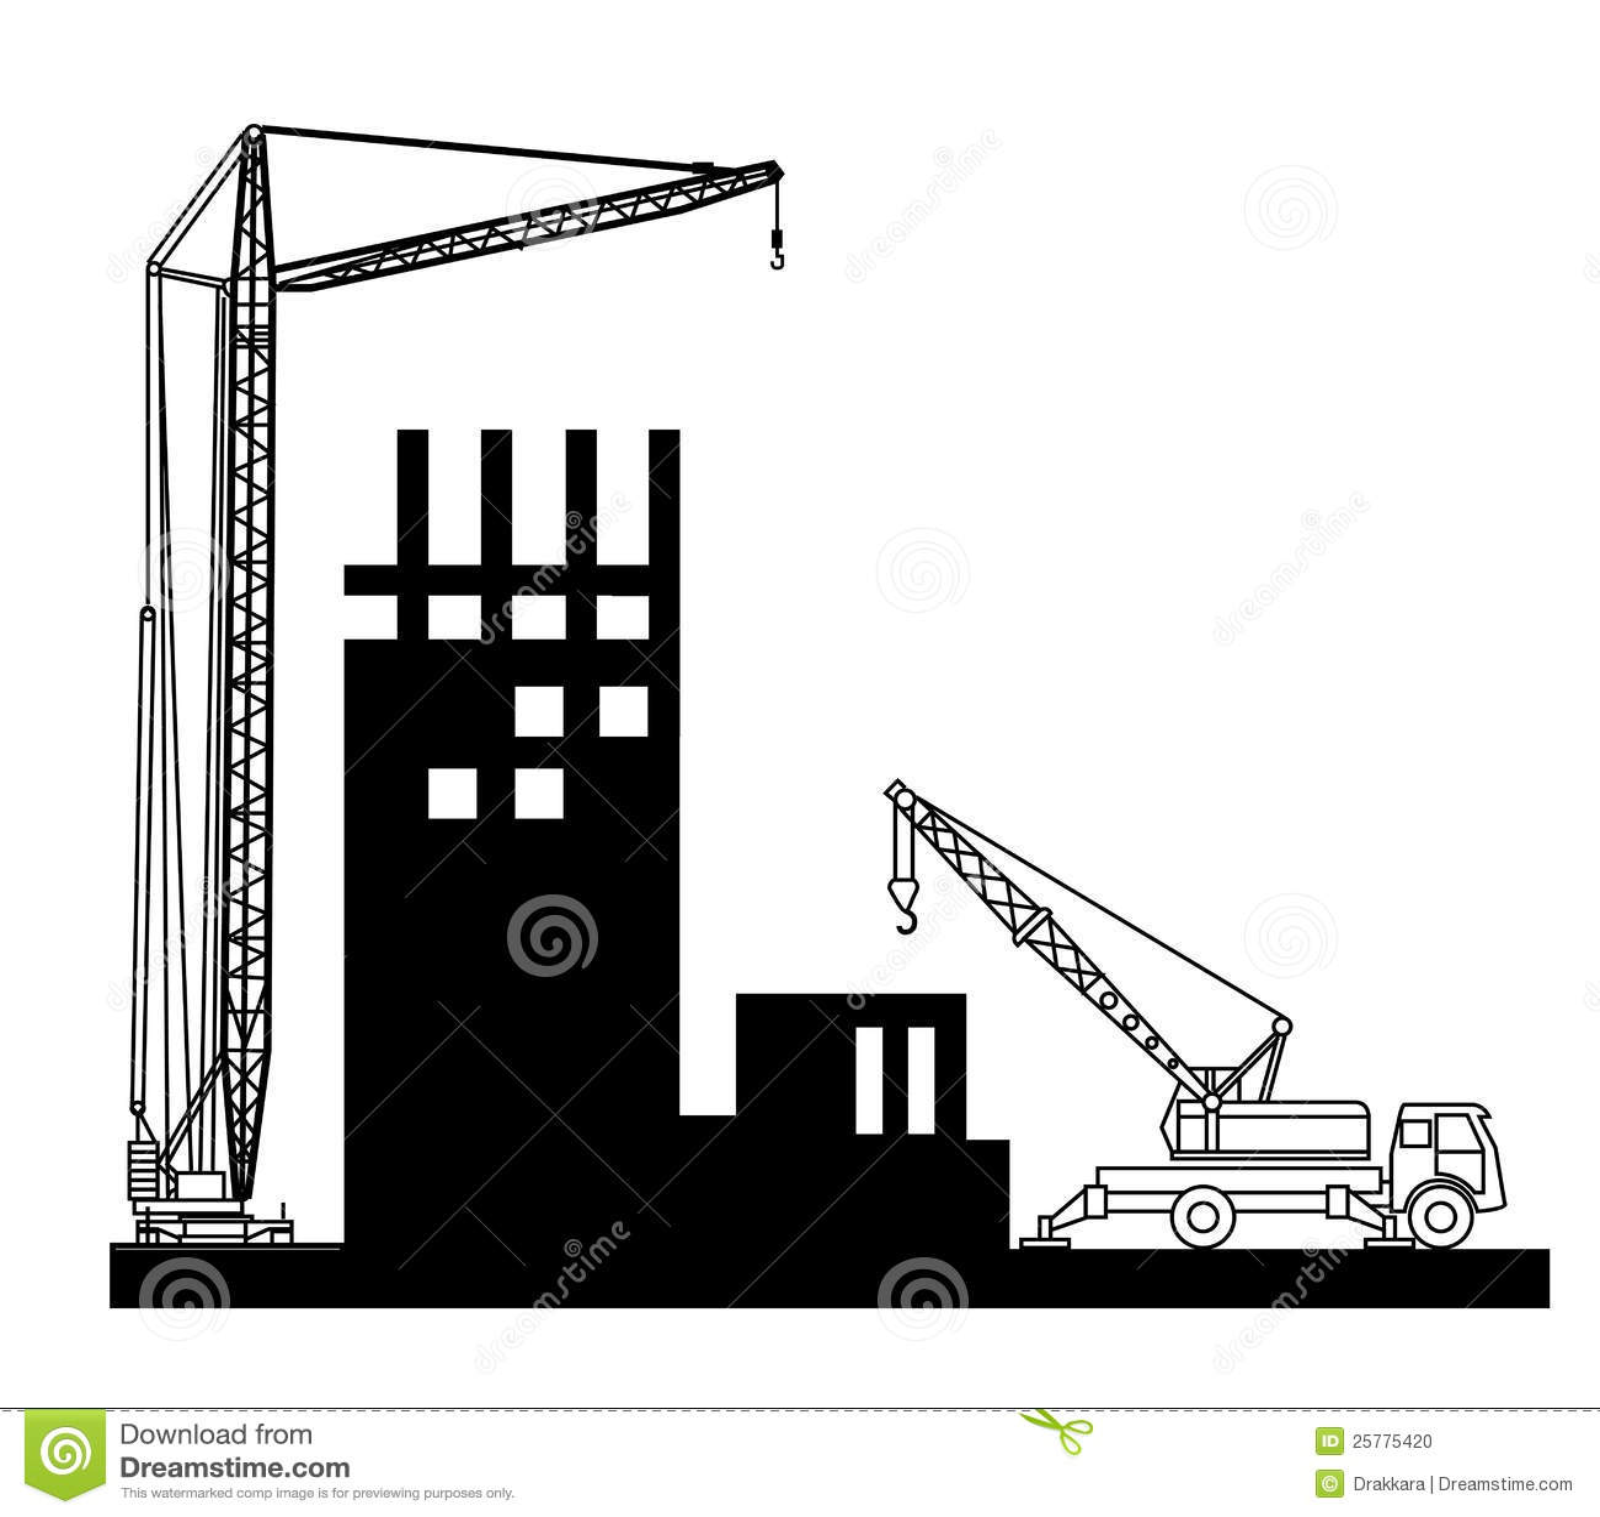 Building Construction Clip Art : Construction of buildings wich crane stock photo image